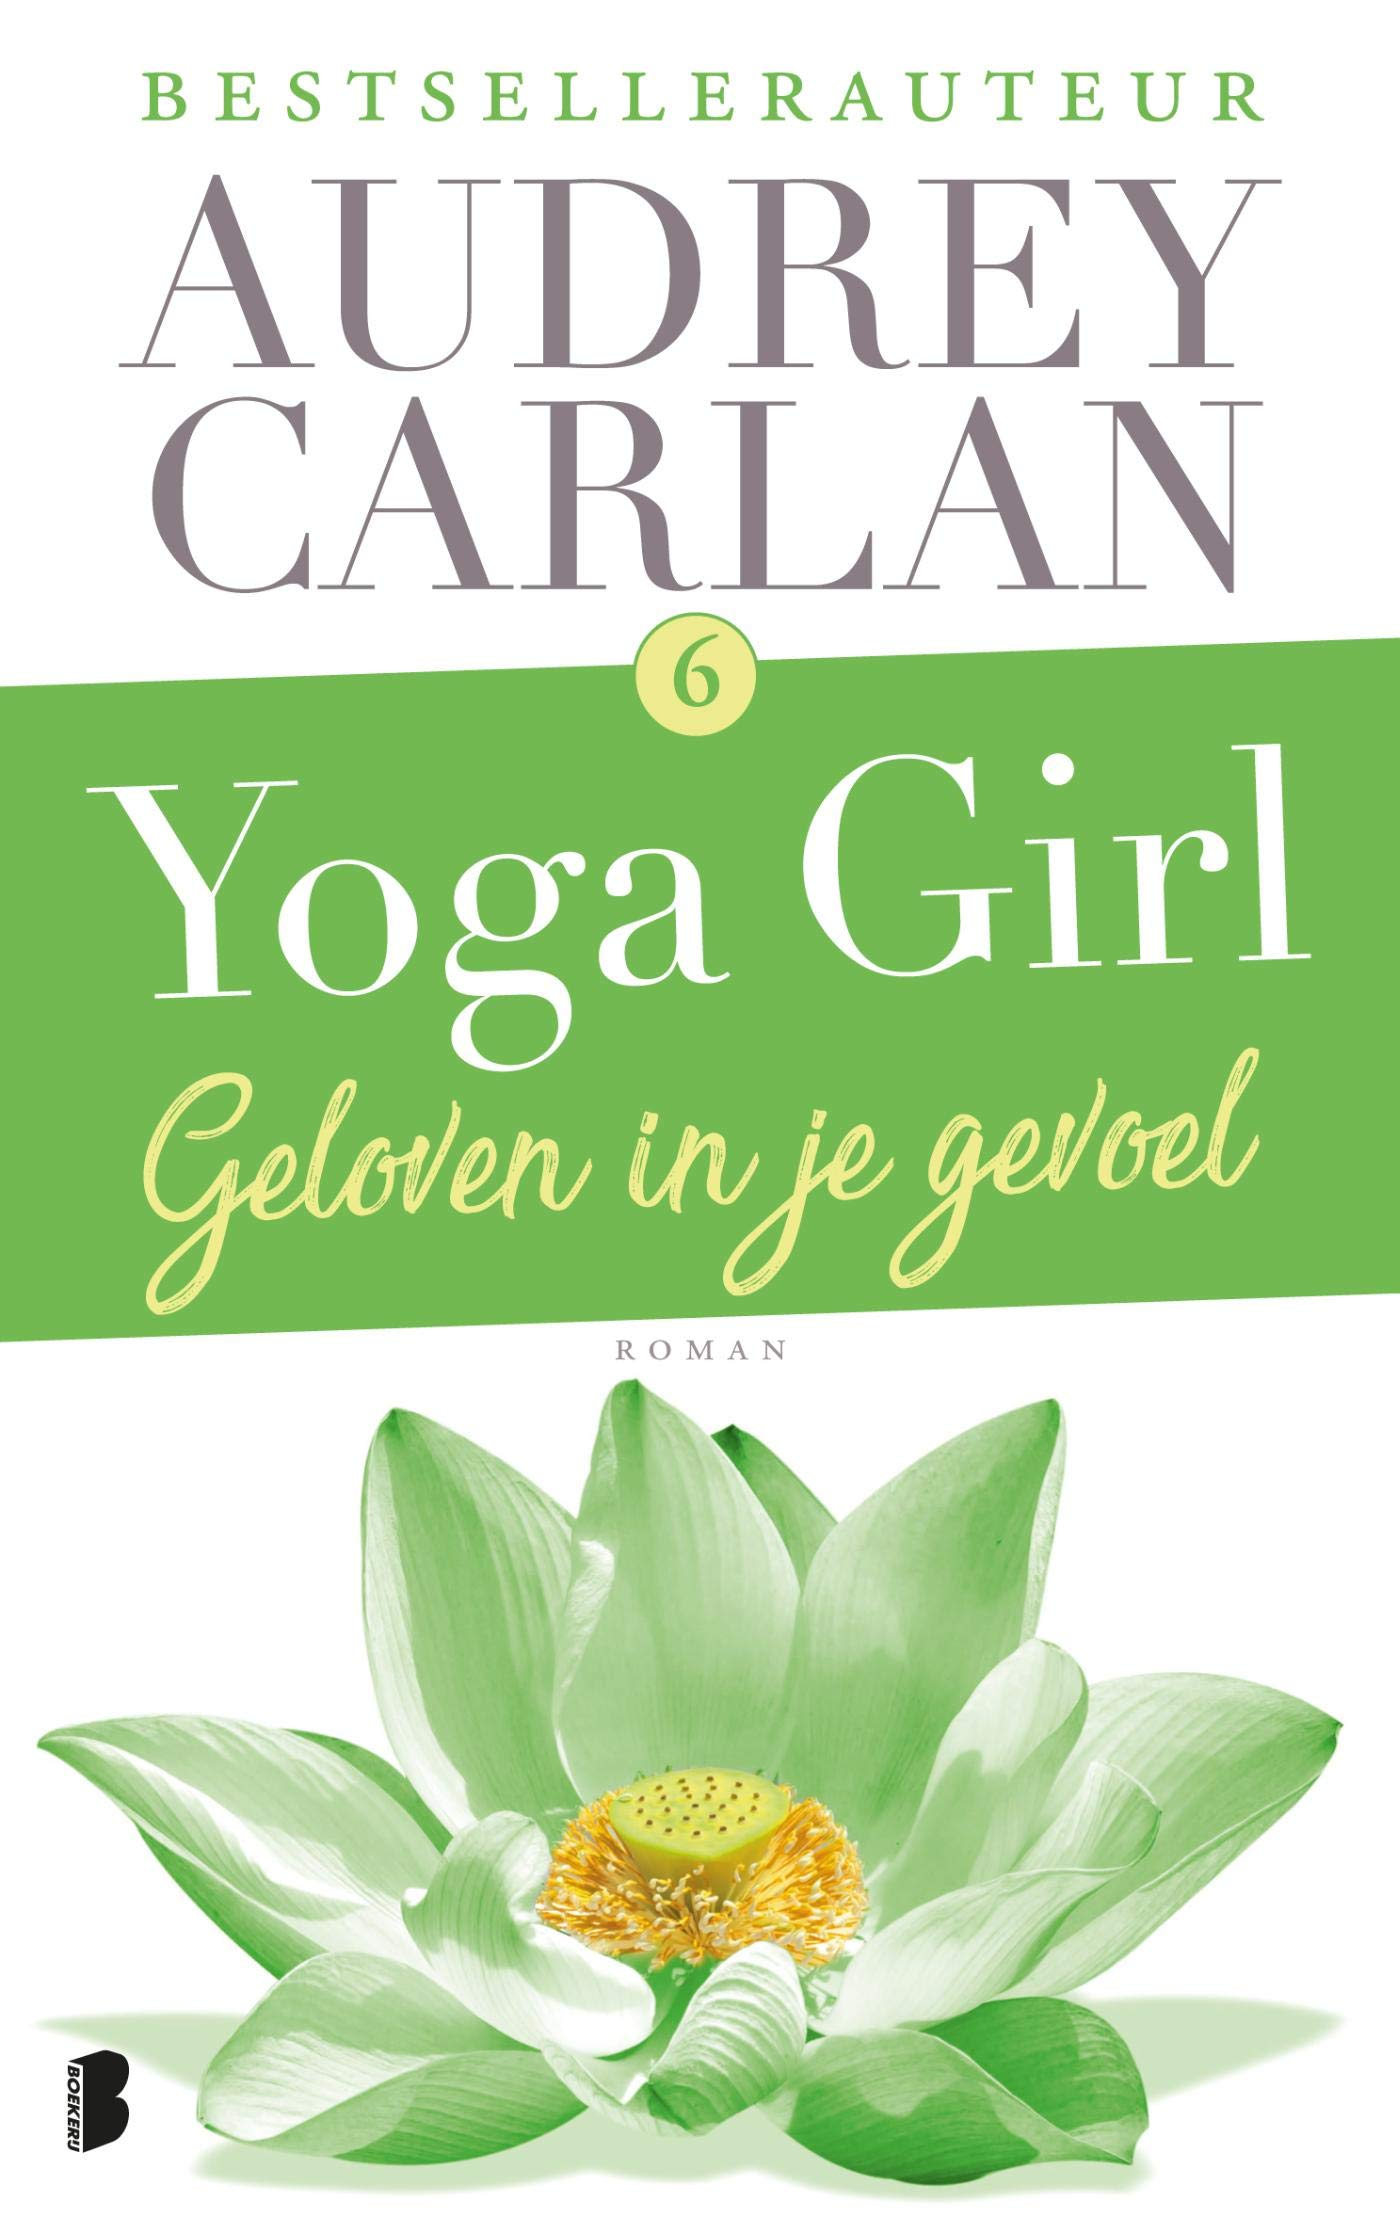 Yoga Girl 6 - Geloven in je gevoel: Amazon.es: Audrey Carlan ...